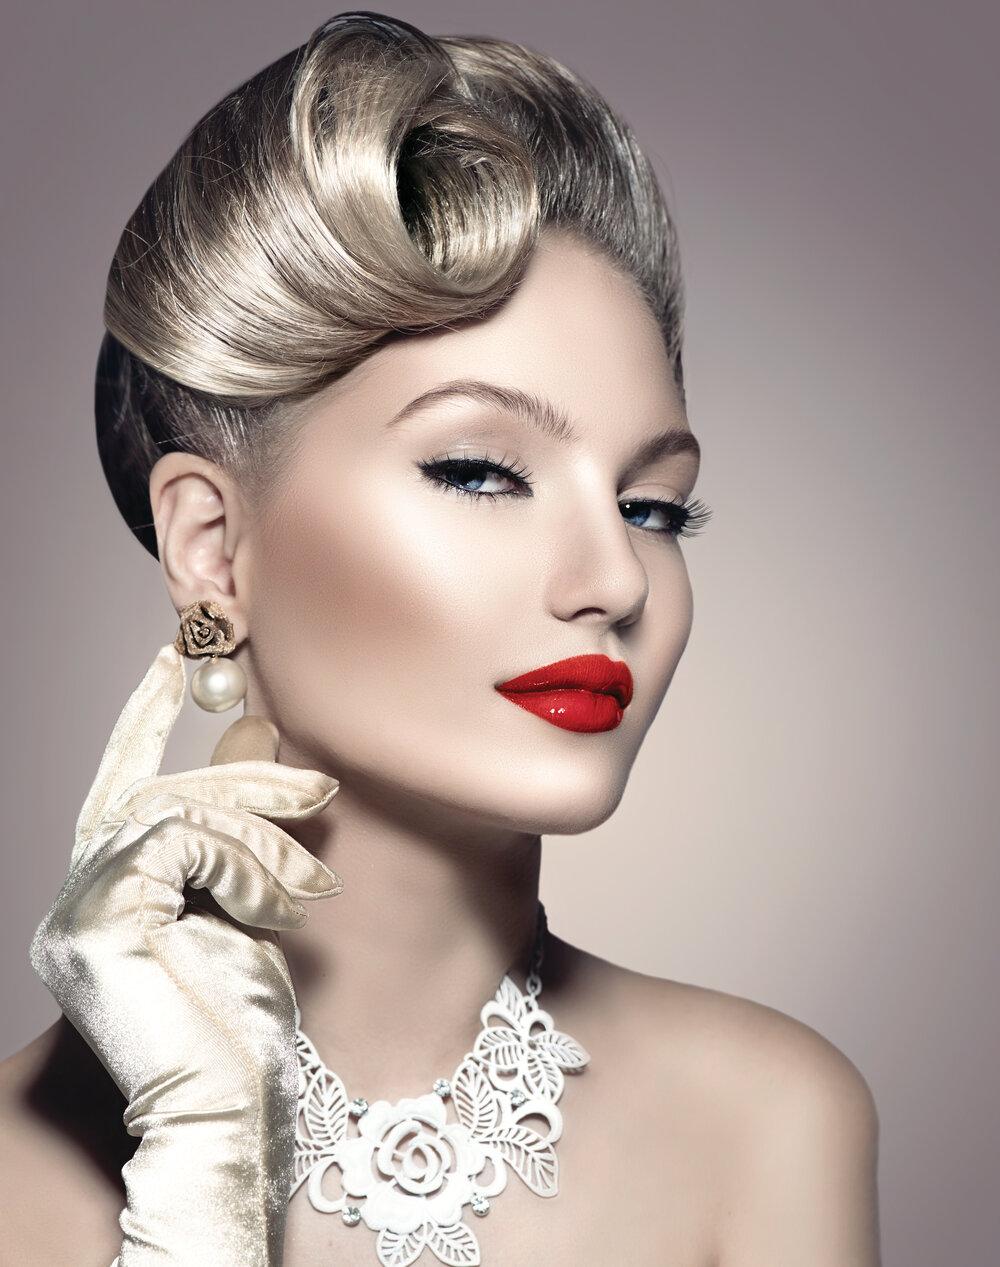 Beauty Bridal Makeup Work August